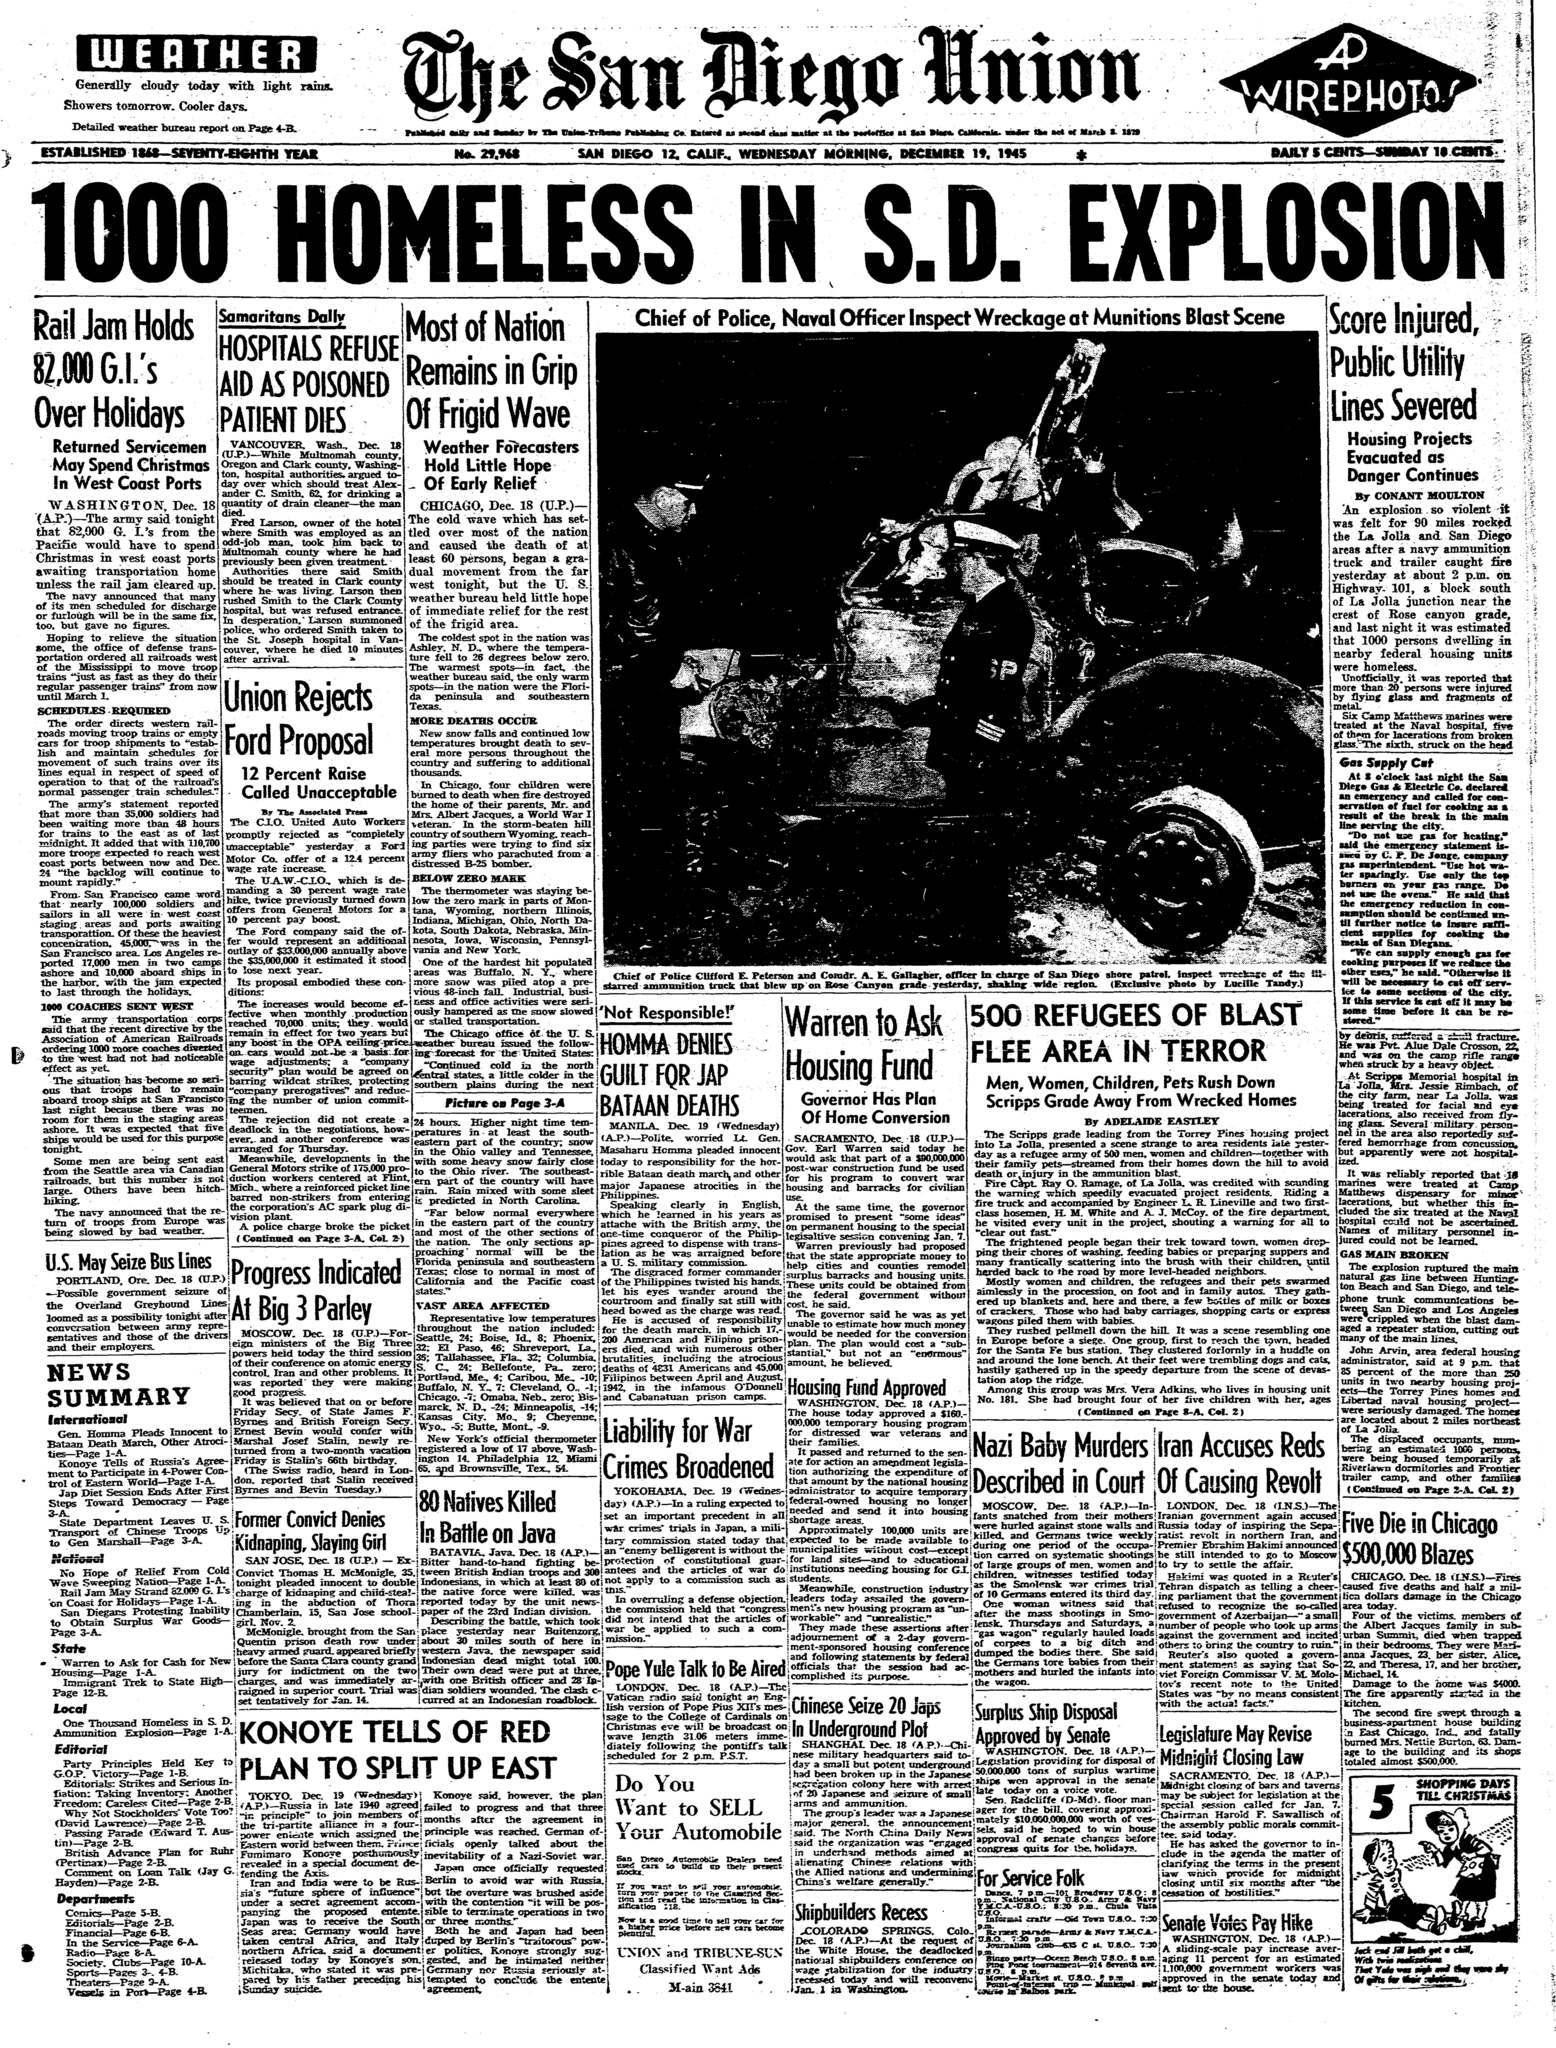 December 19, 1945